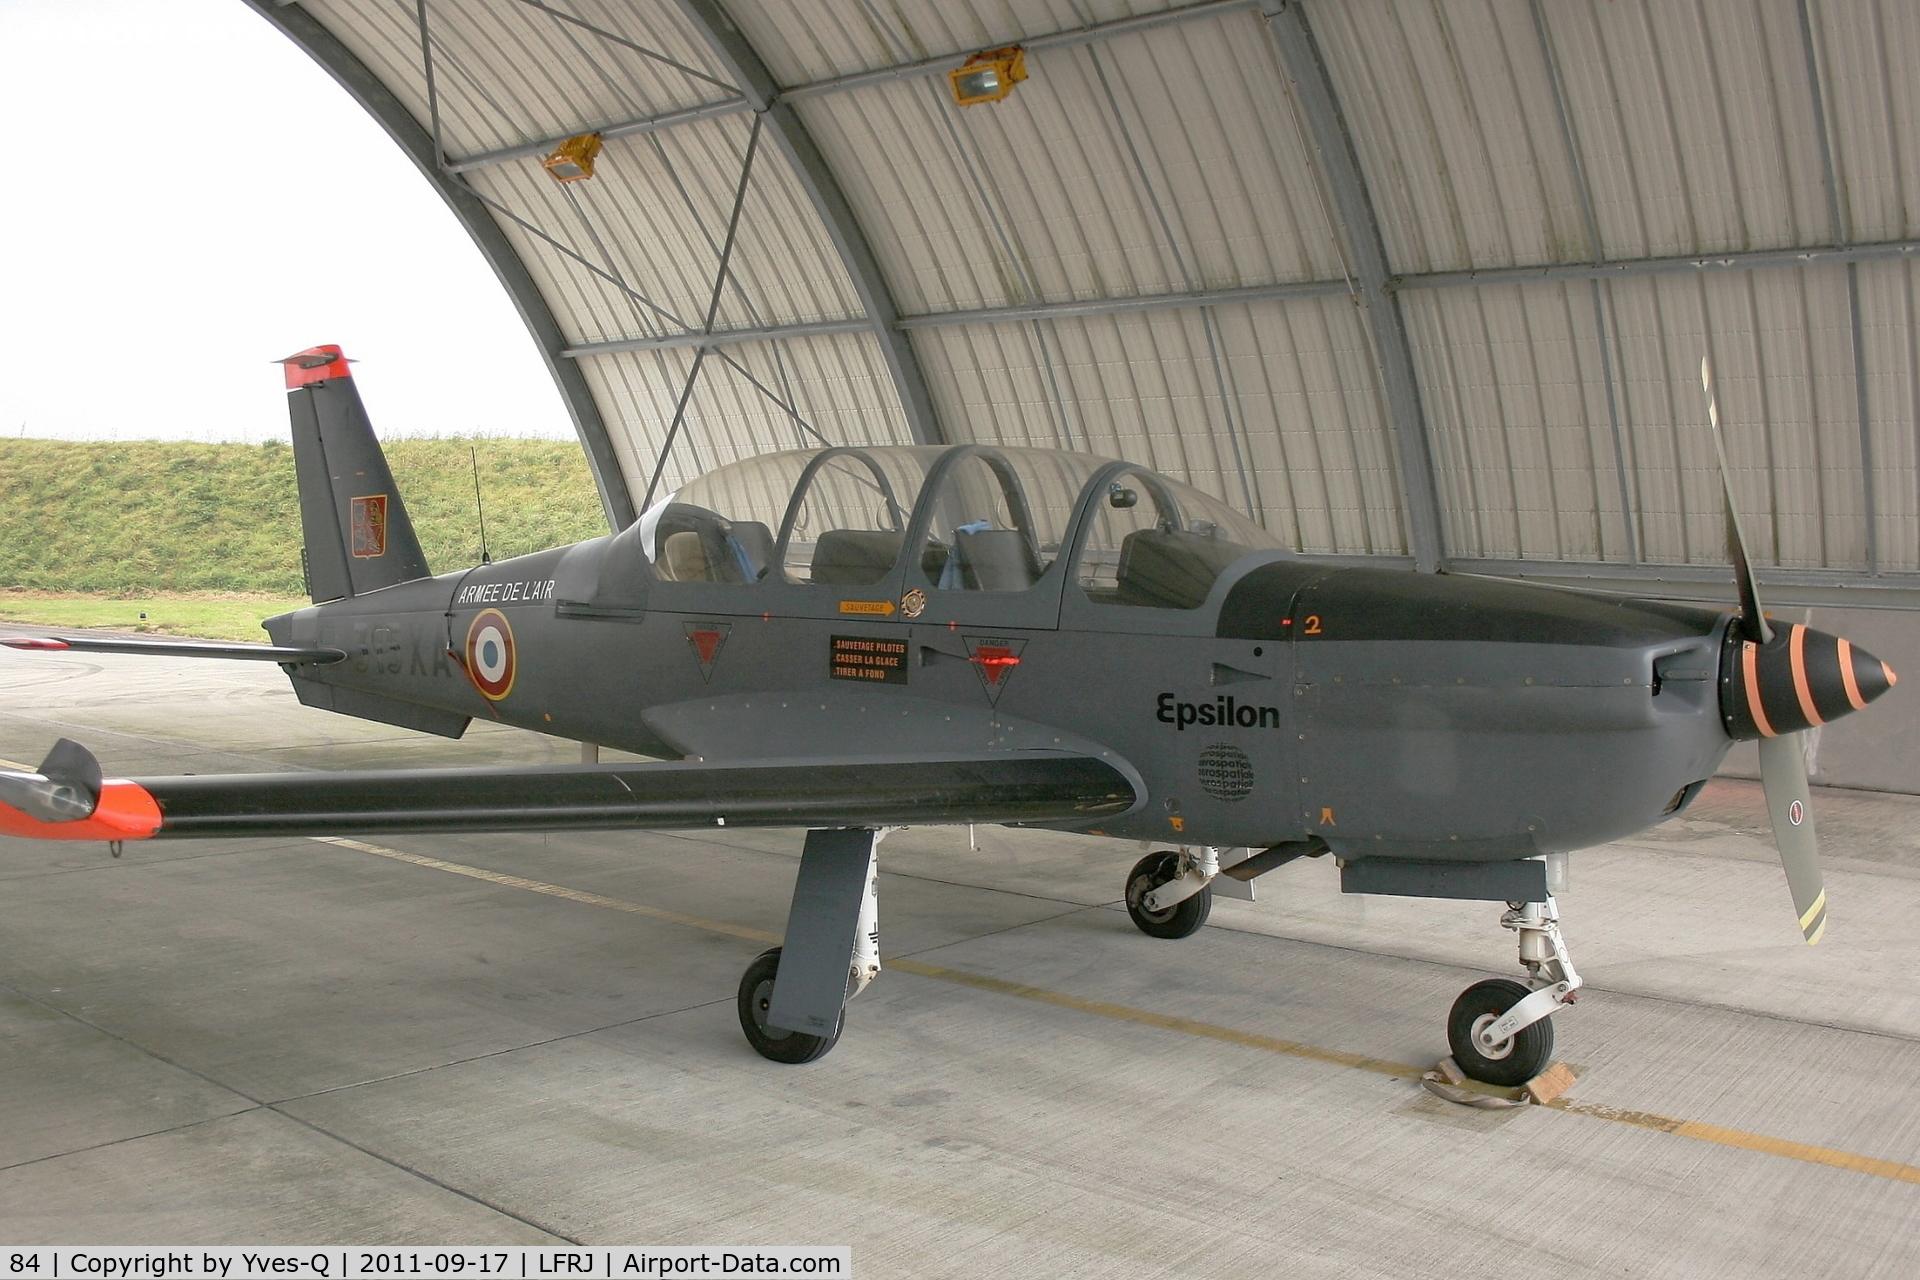 84, Socata TB-30 Epsilon C/N 84, Socata TB-30 Epsilon (315-XA), Landivisiau Naval Air Base (LFRJ)